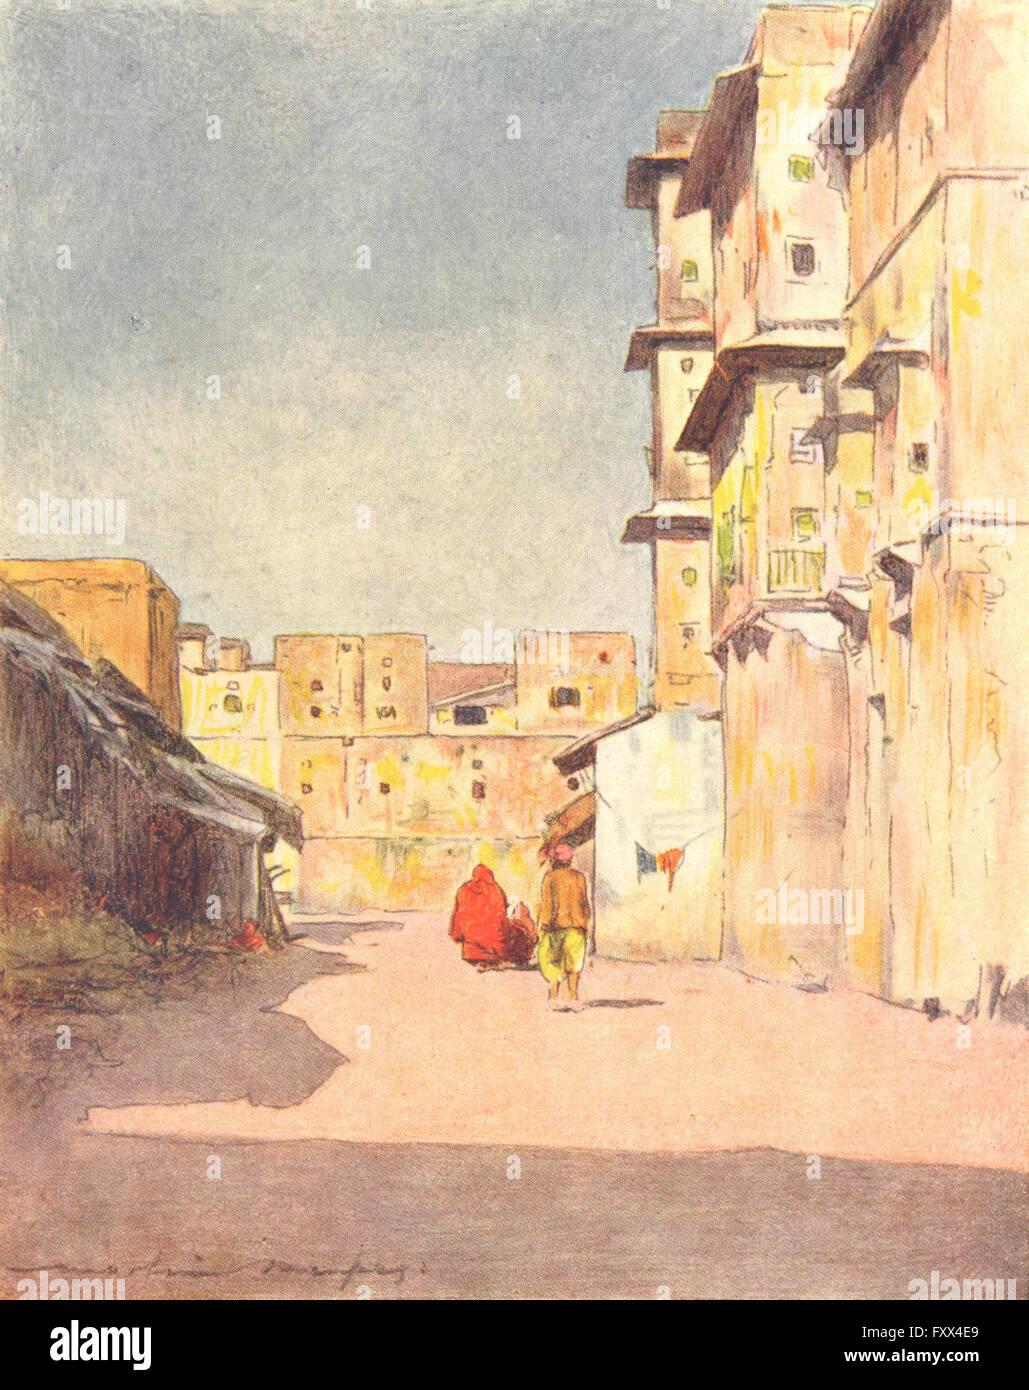 INDIA: una strada a Jaipur, antica stampa 1905 Immagini Stock